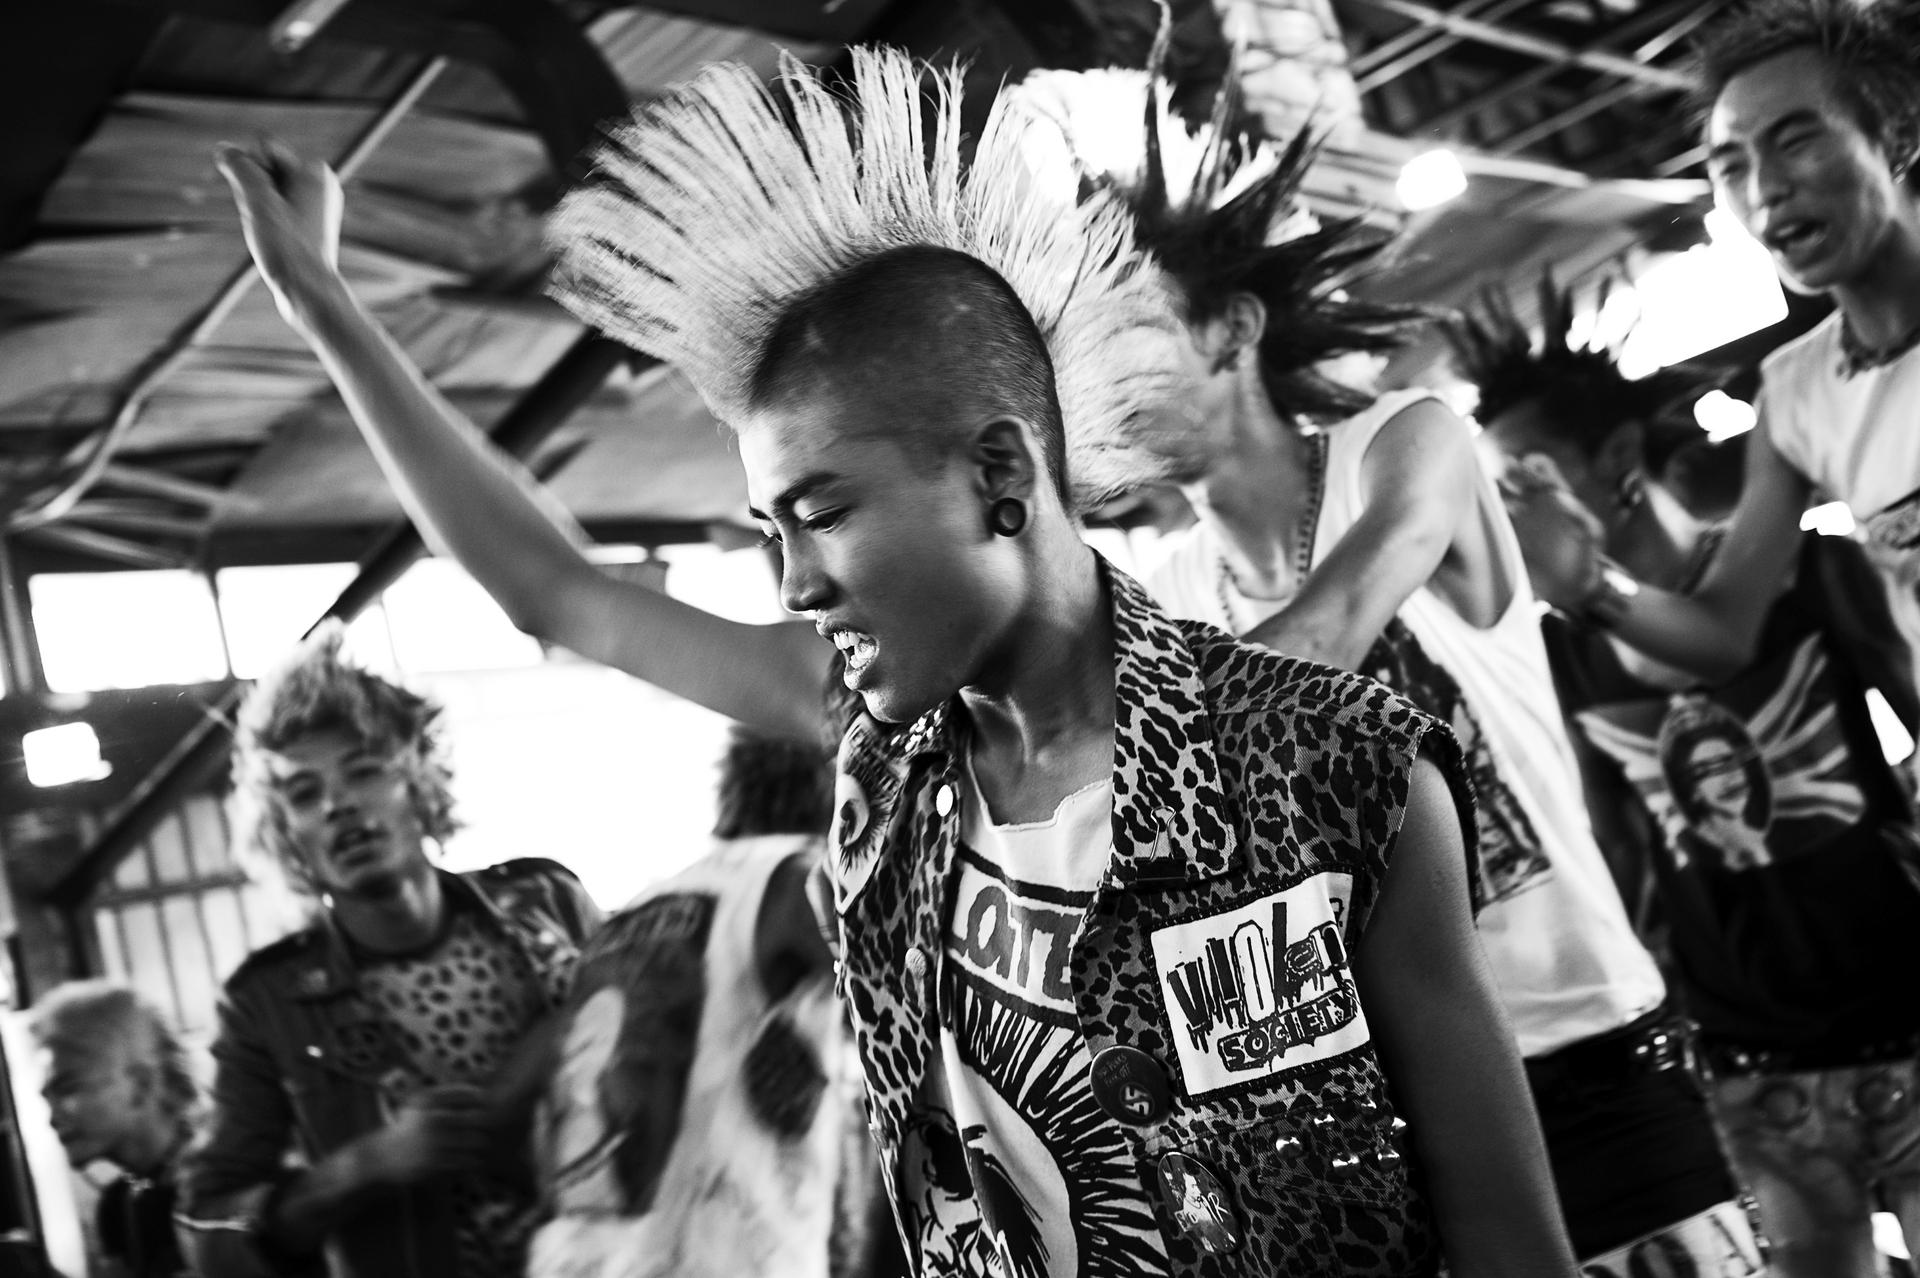 The punk rock movement